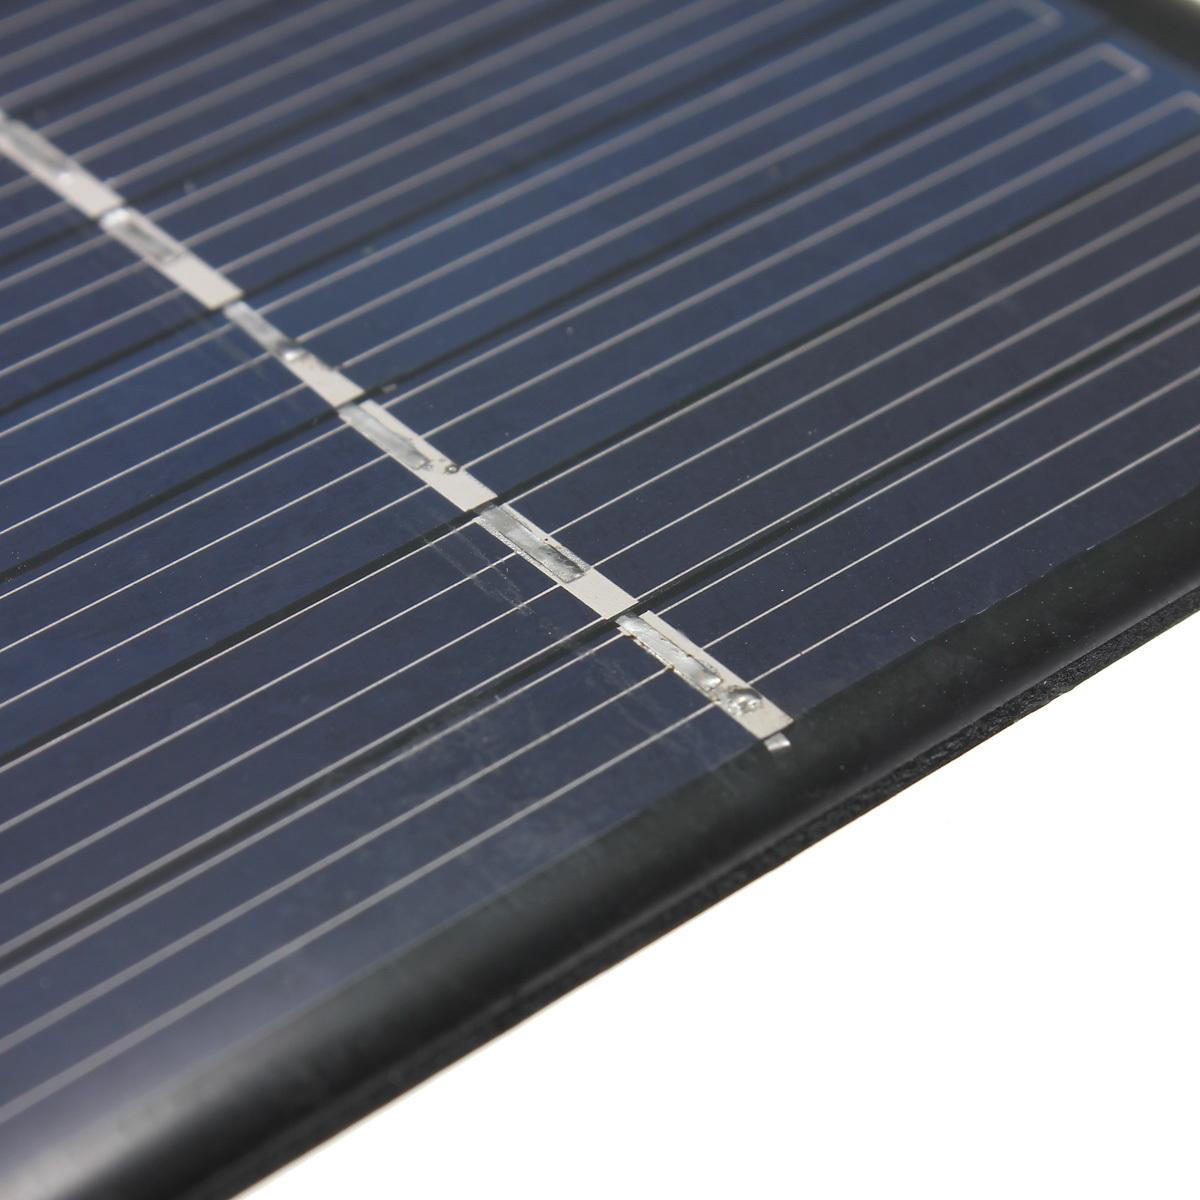 Mini 5.5 V 1 watt 180mA polikristalin panel surya modul diseduh sendiri charger .